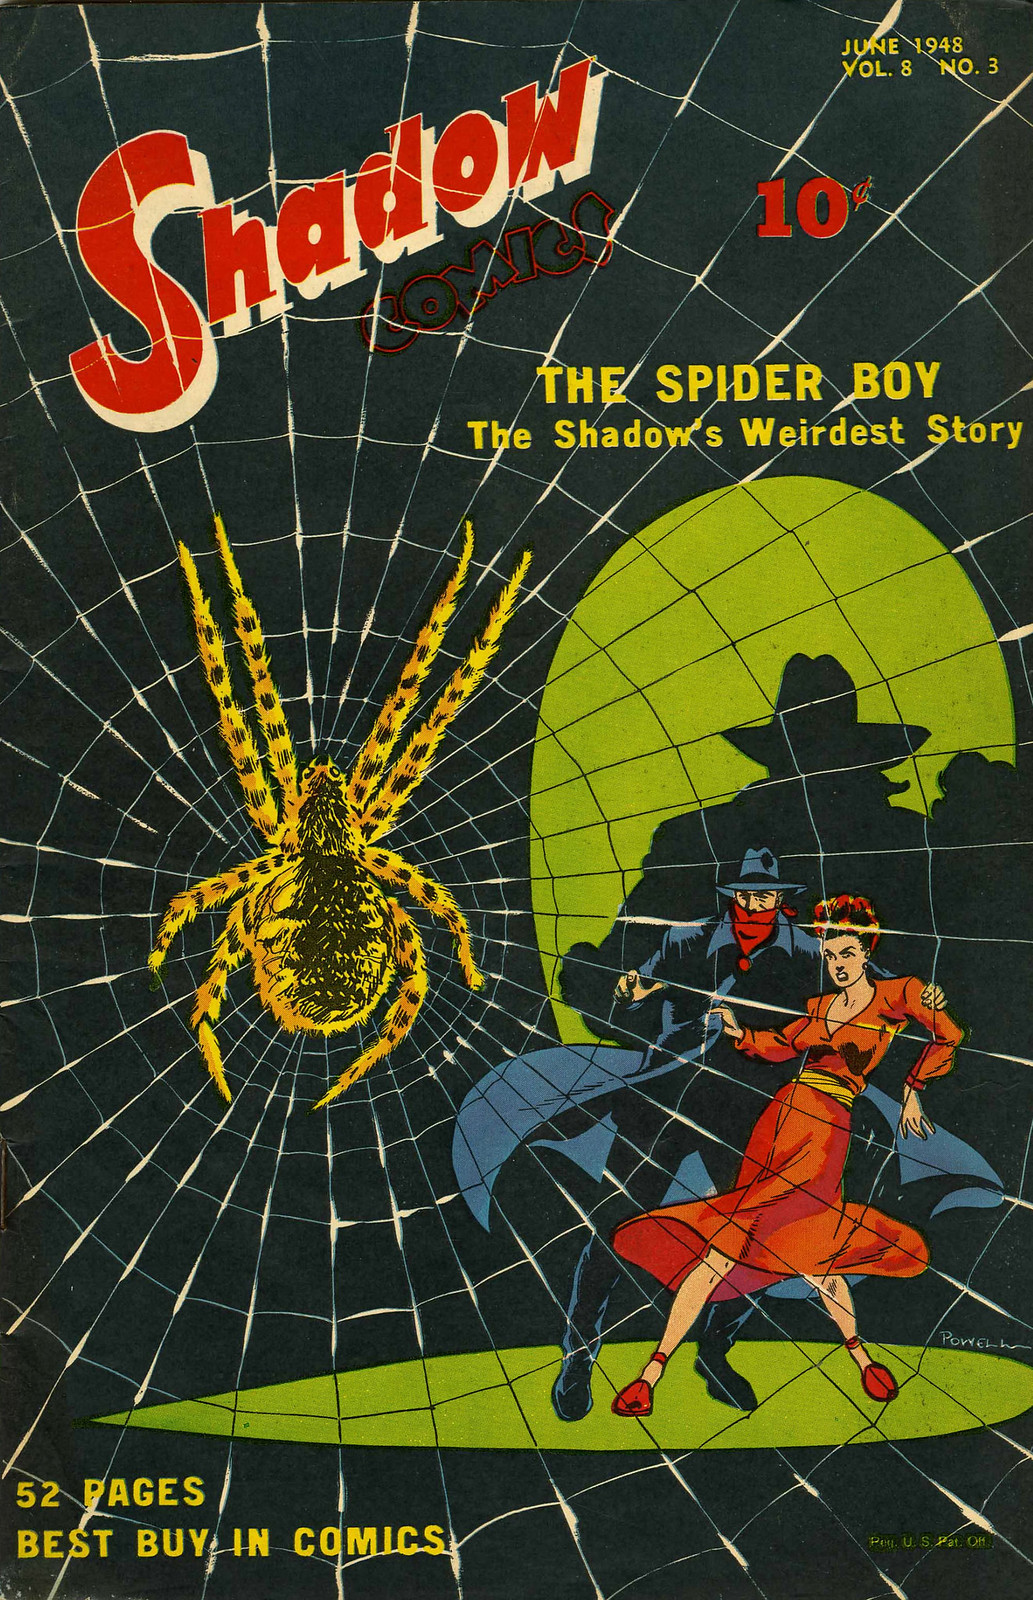 Shadow Comics V8#3 (Street & Smith, 1948) Bob Powell Cover